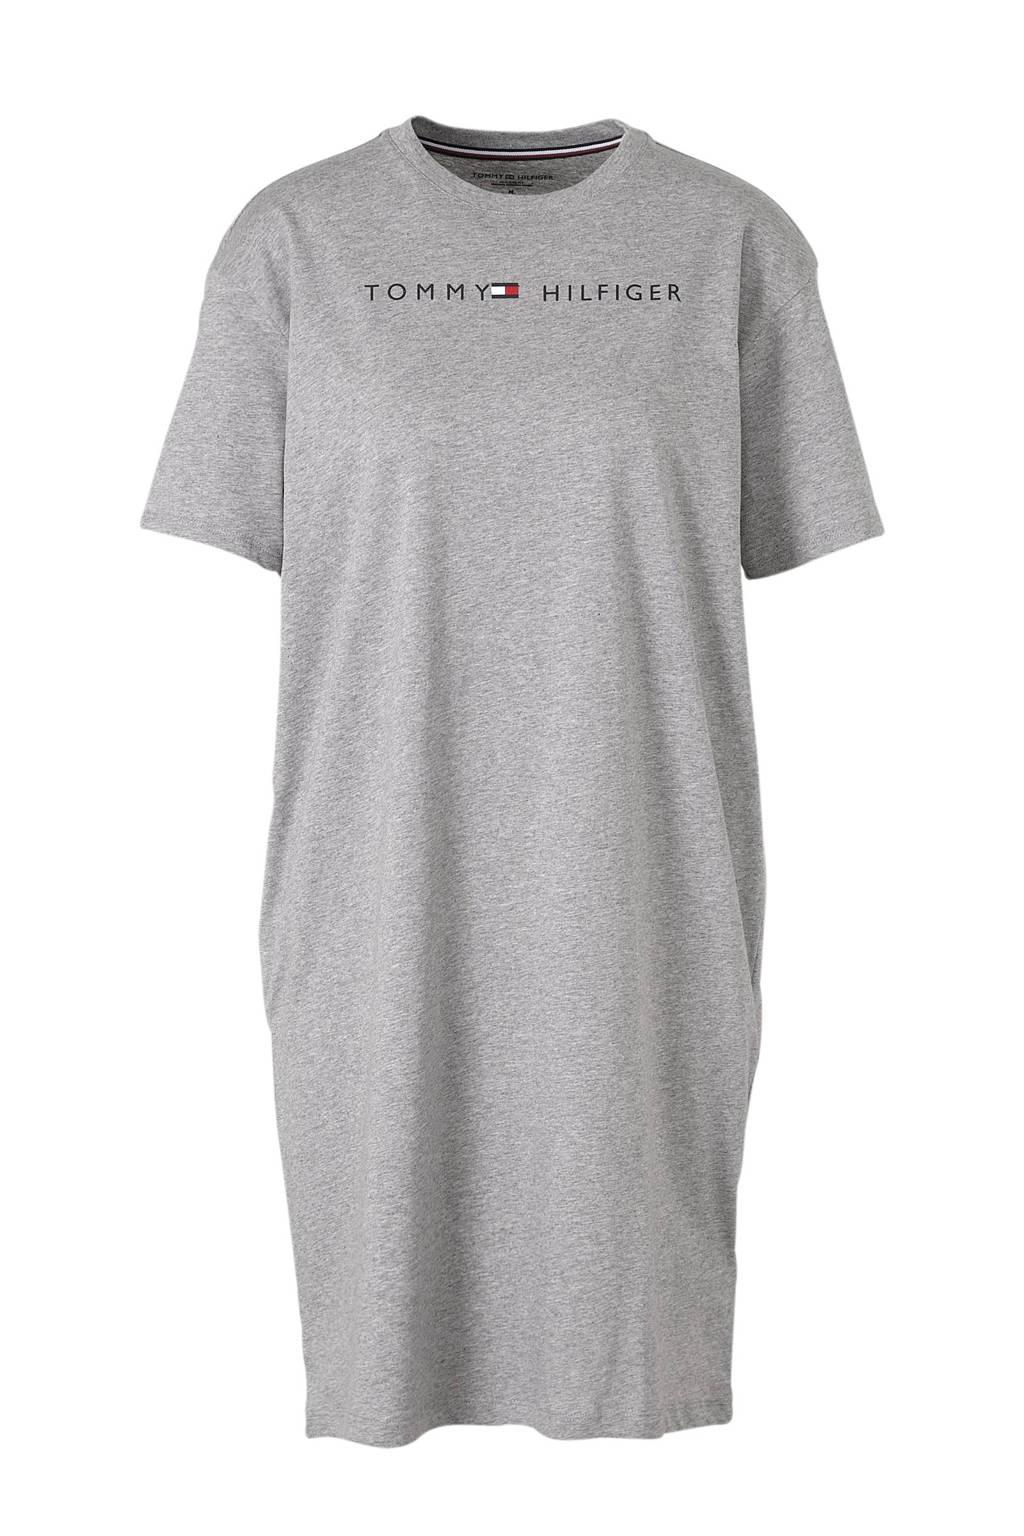 Tommy Hilfiger nachthemd grijs melee, Grijs melee